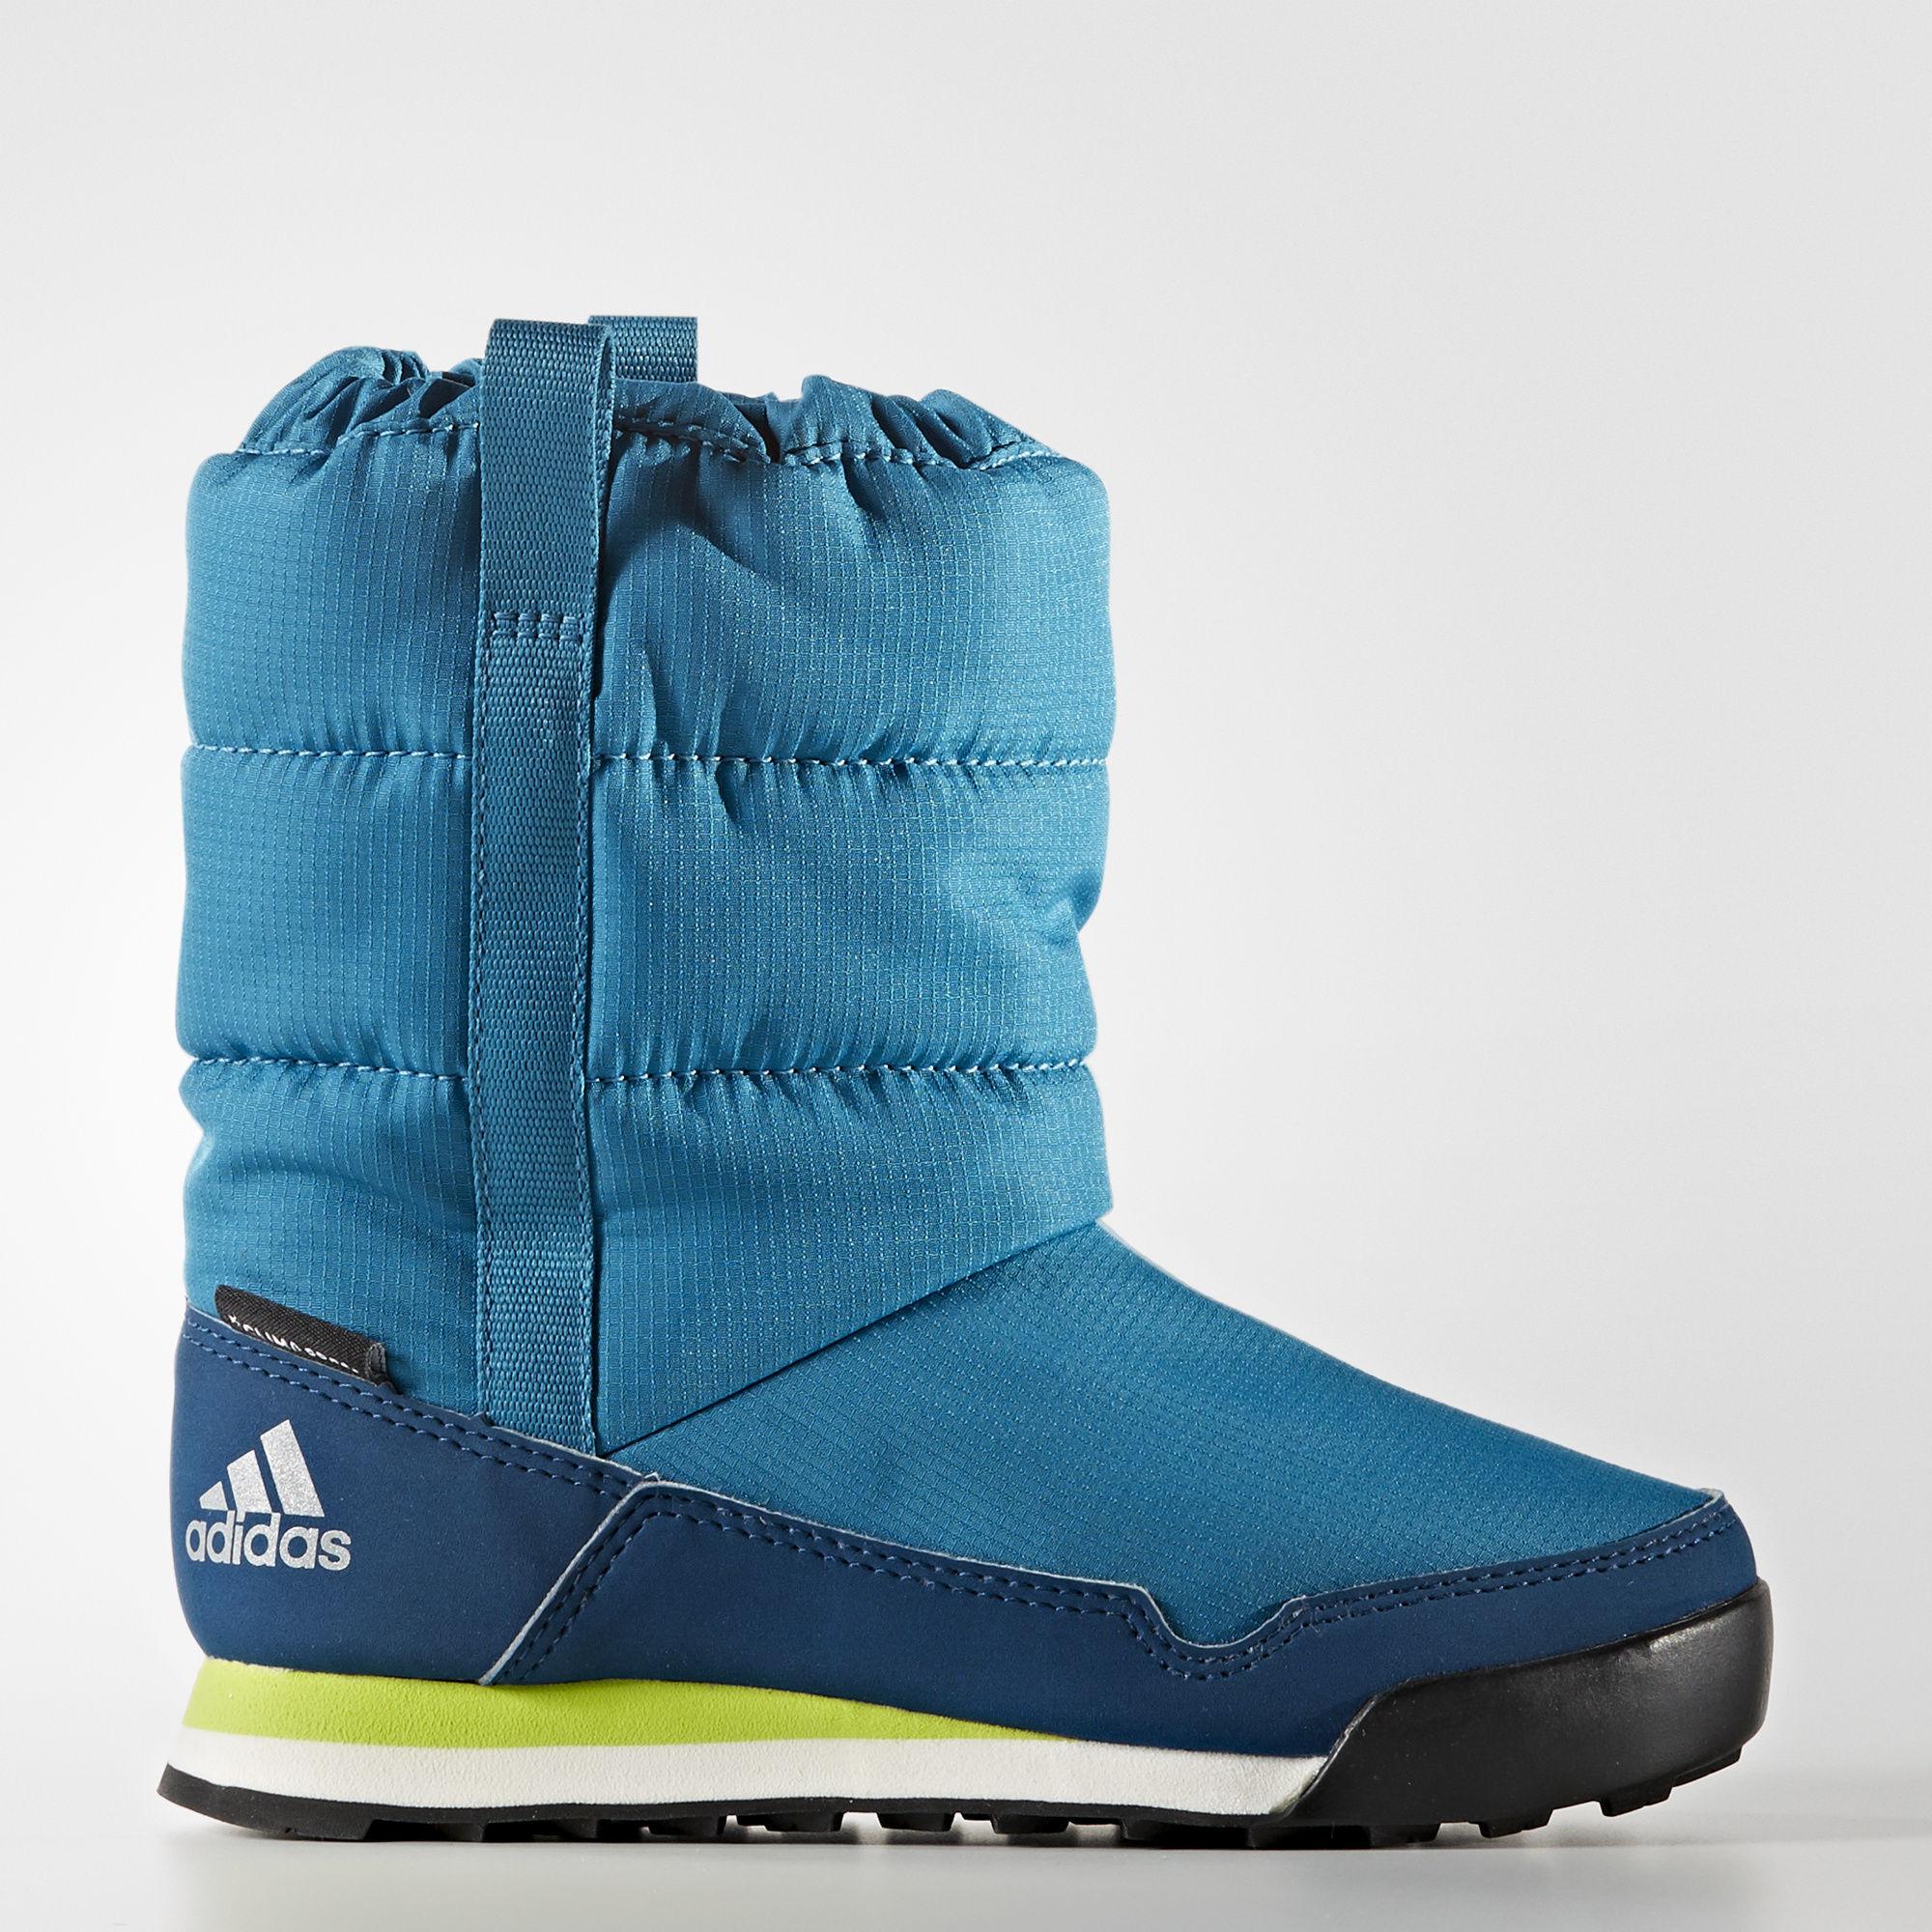 adidas performance snow pitch